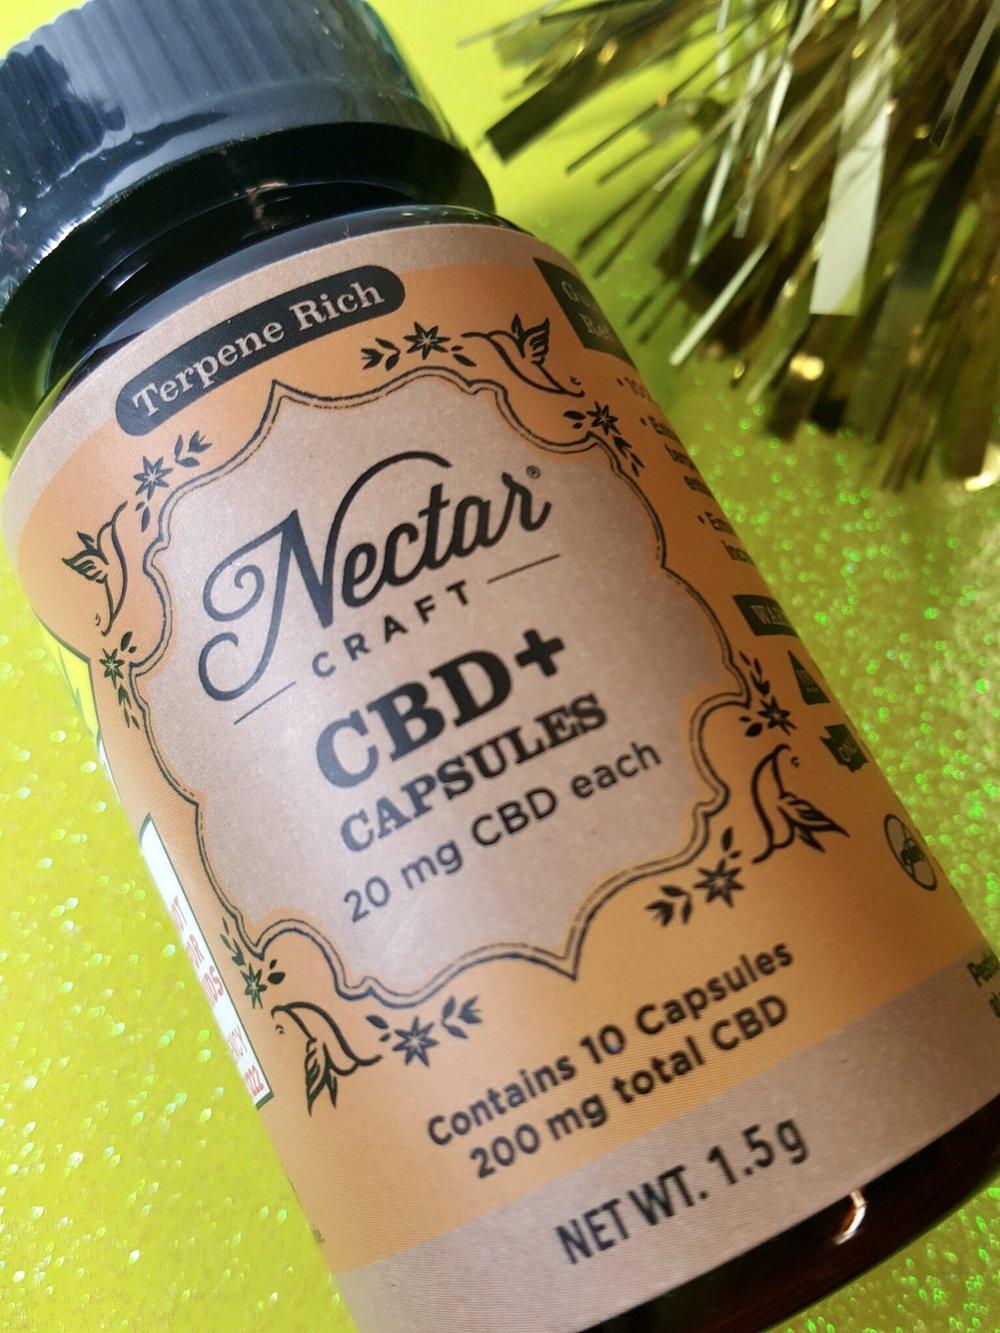 Nectar Craft CBD Capsules Ganja Goddess